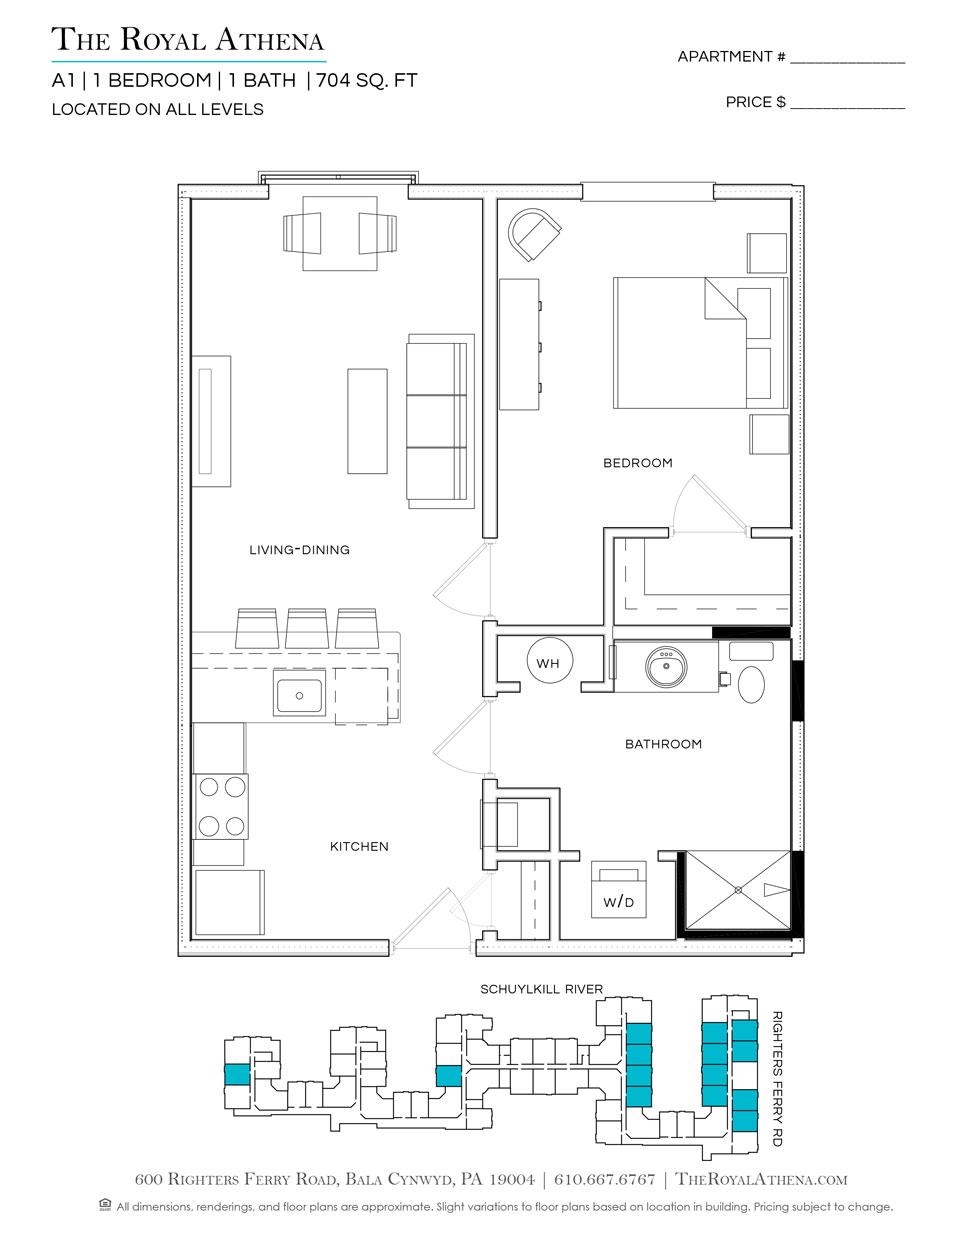 P0659218 a1 2 floorplan 1